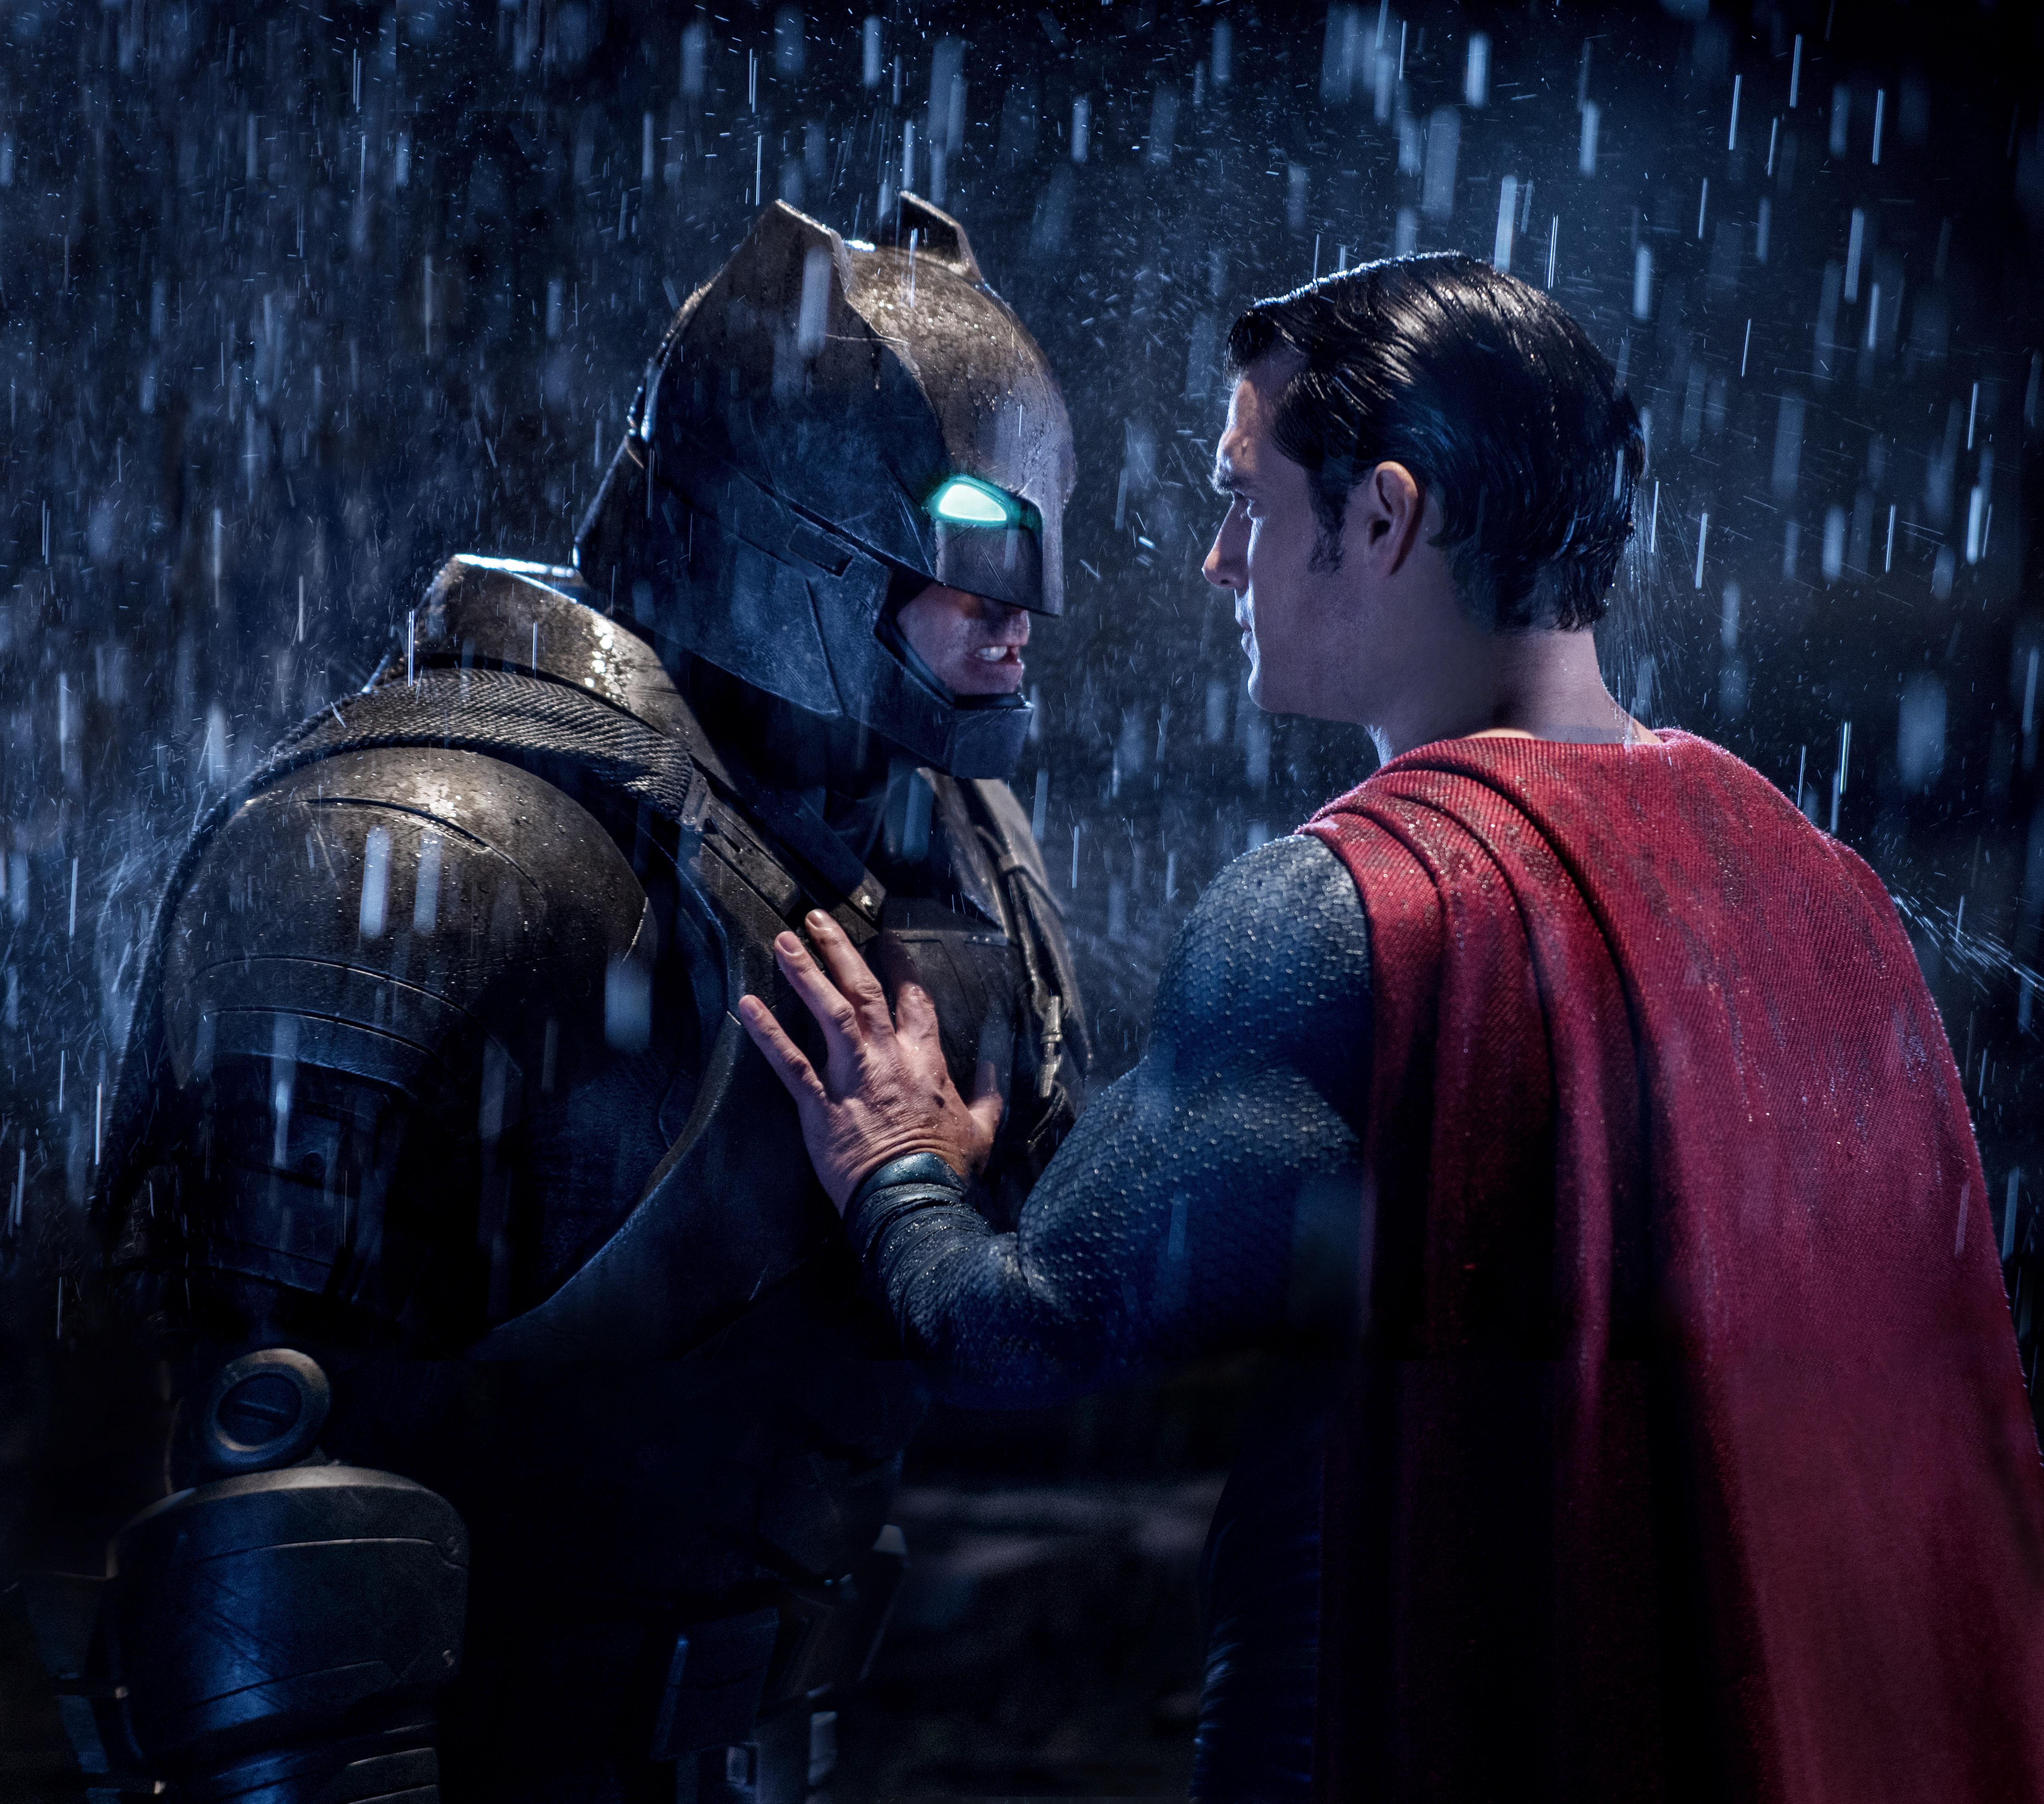 batman vs superman yify 1080p download